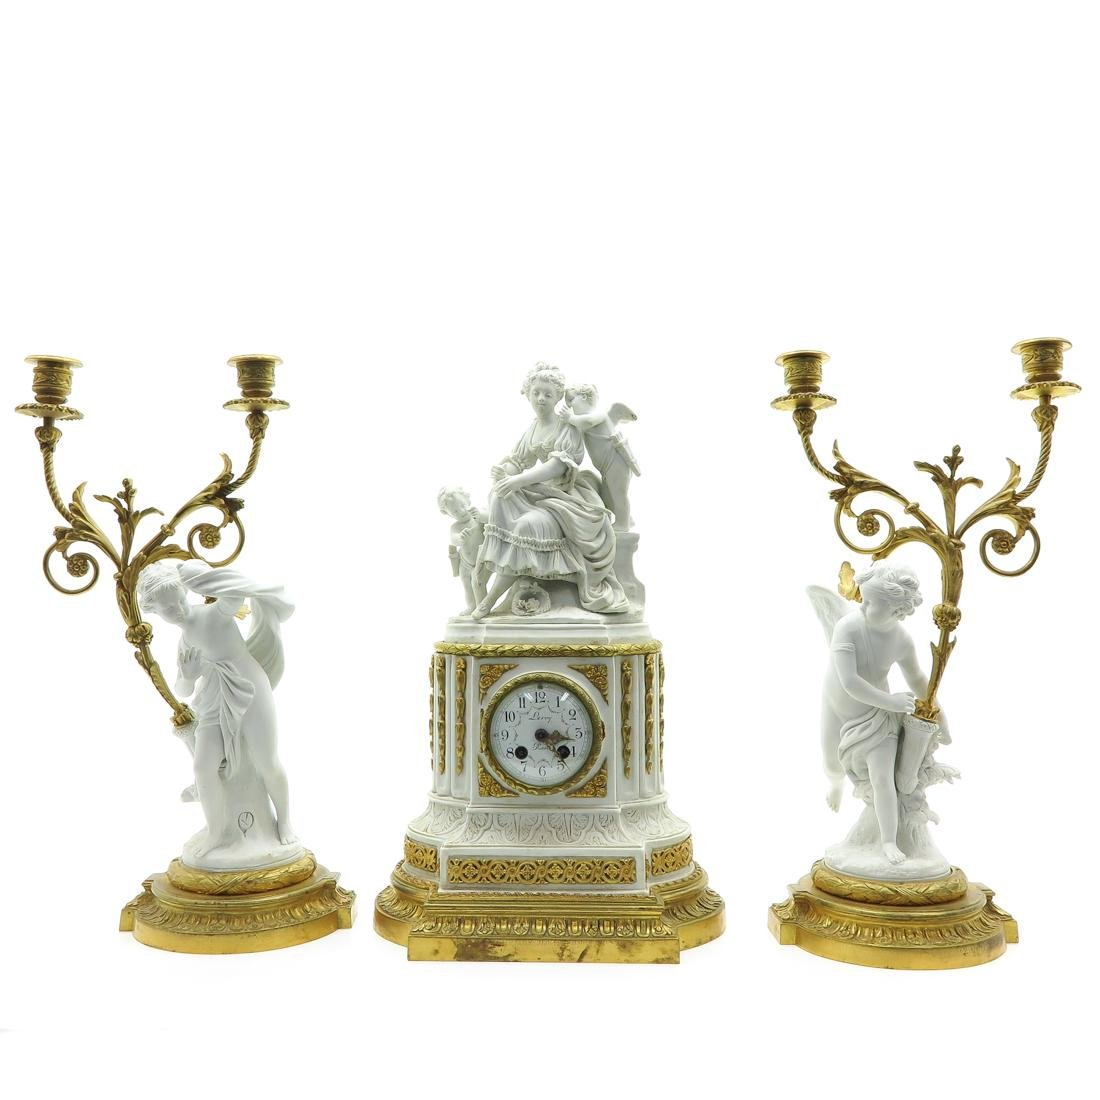 19th Century 3 Piece French Bisque Clock Set